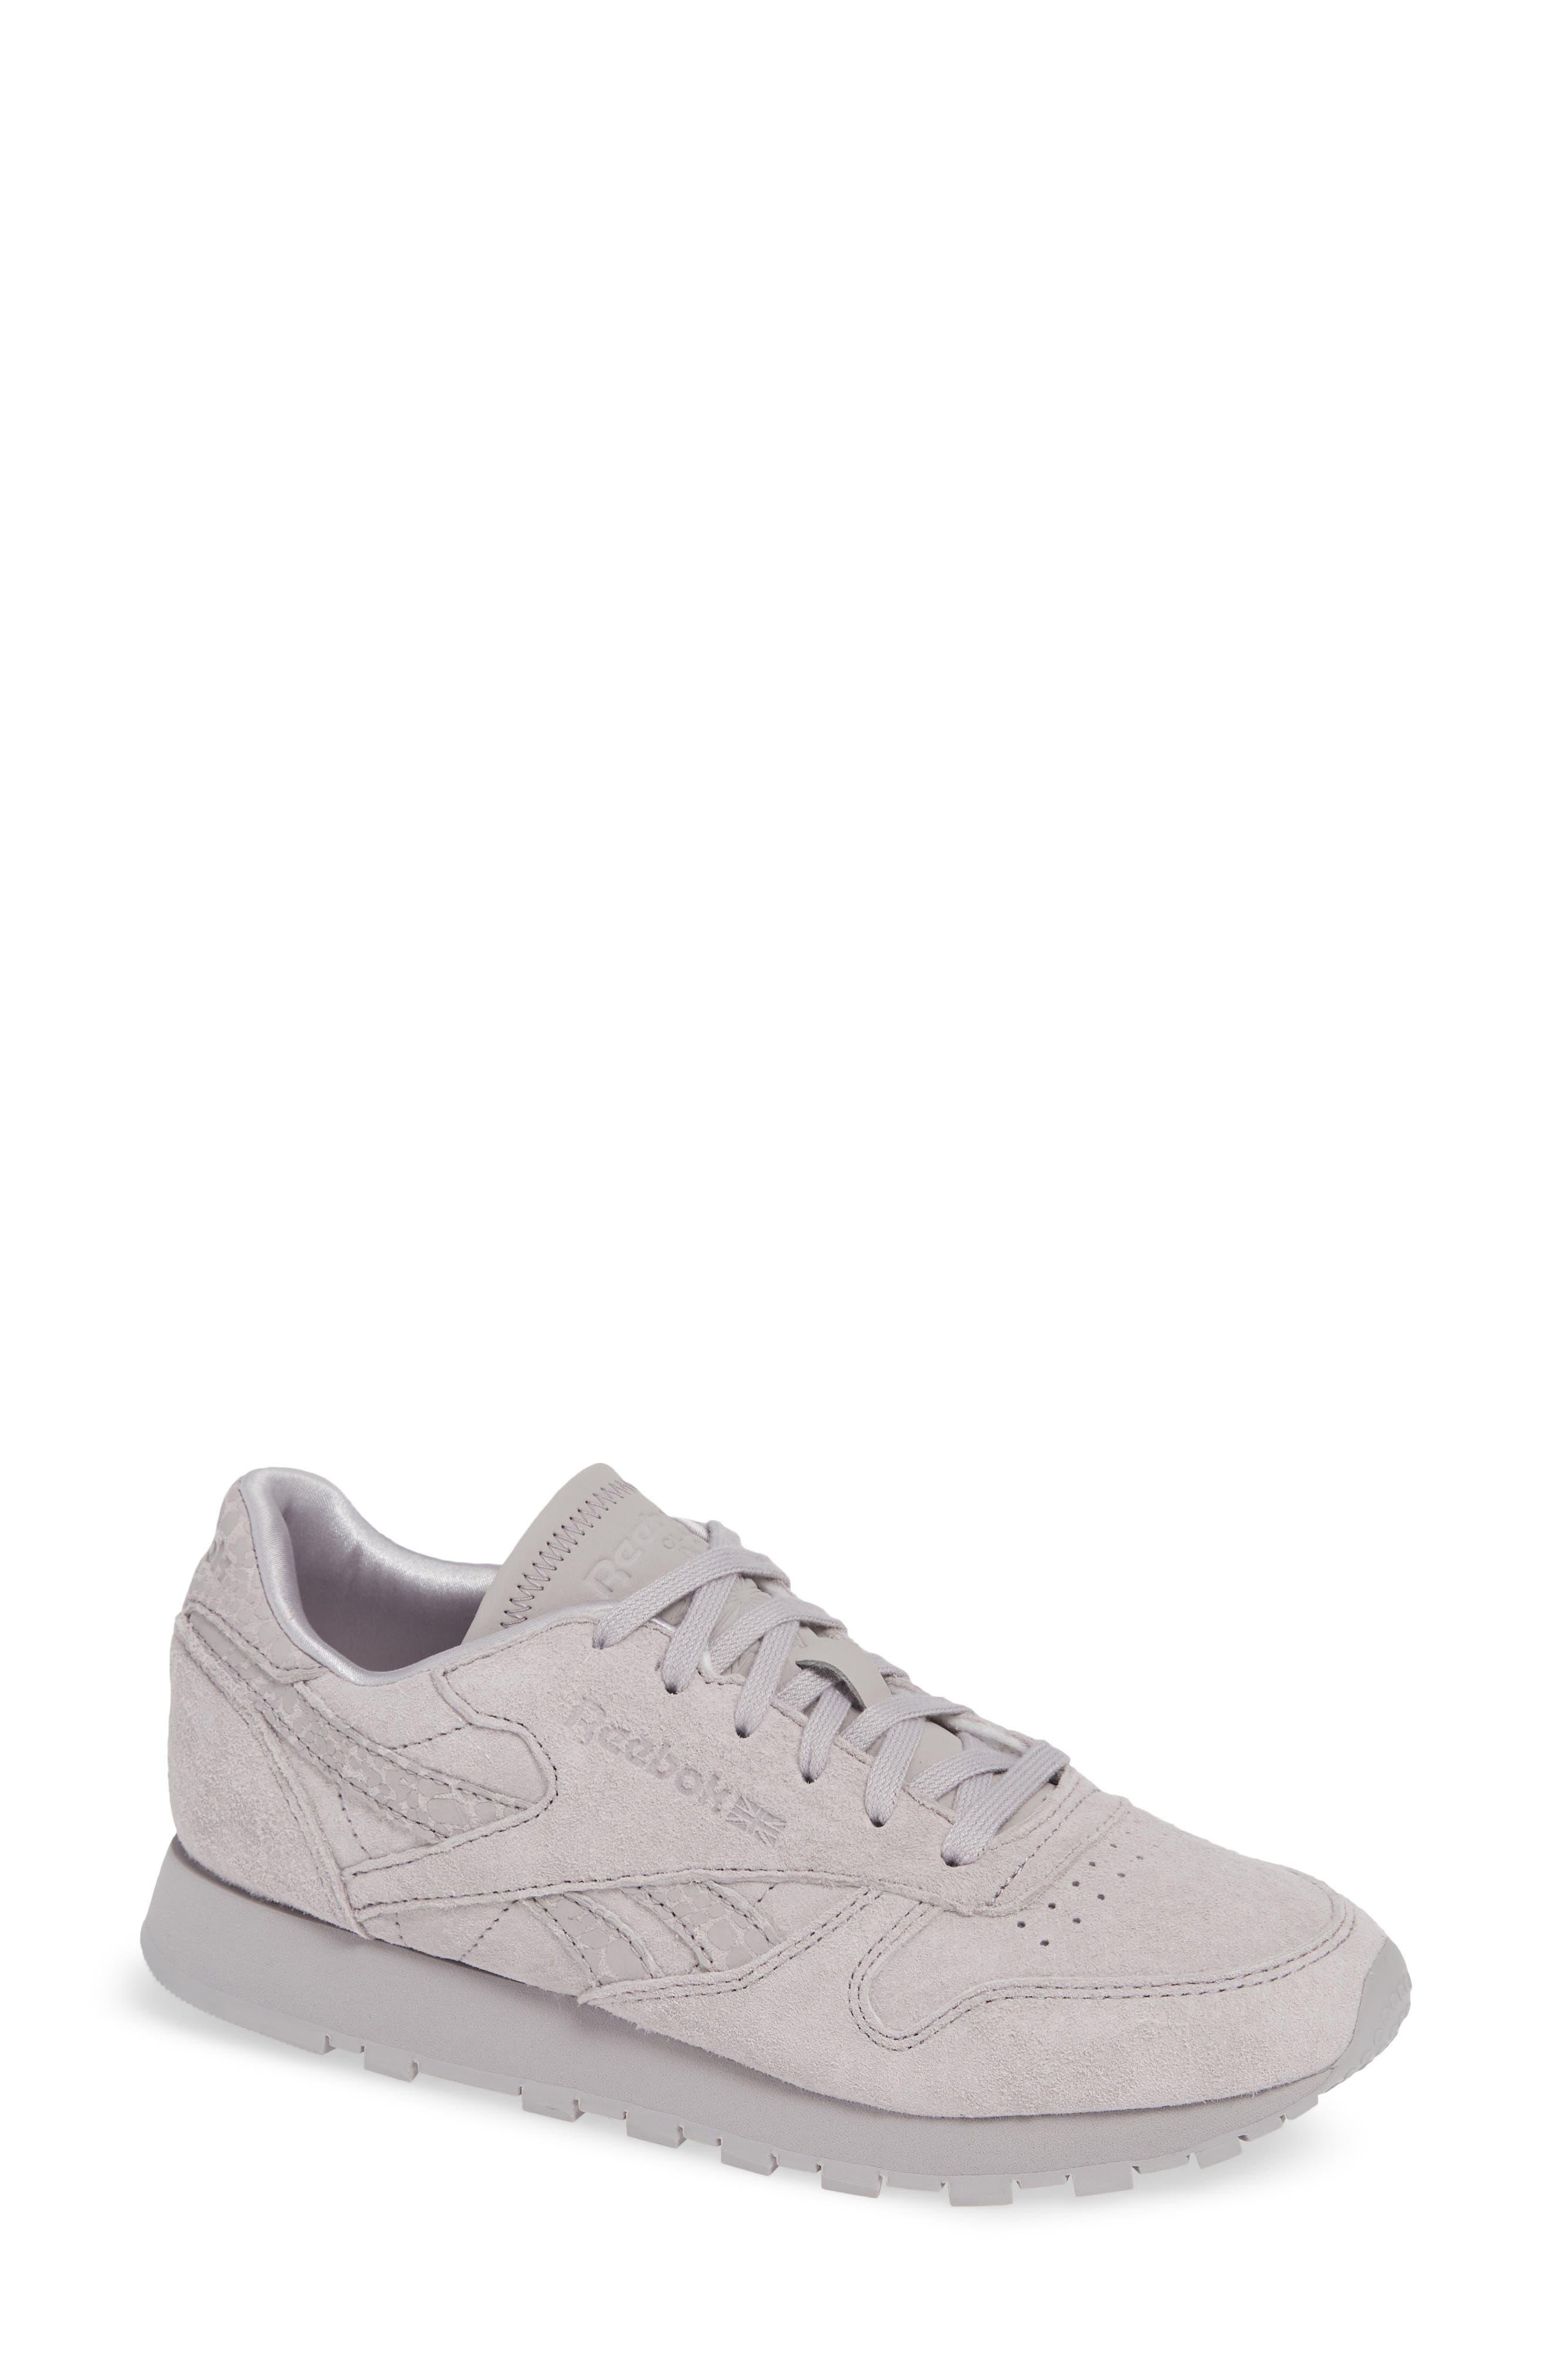 REEBOK,                             Classic Leather Sneaker,                             Main thumbnail 1, color,                             WHISPER GREY